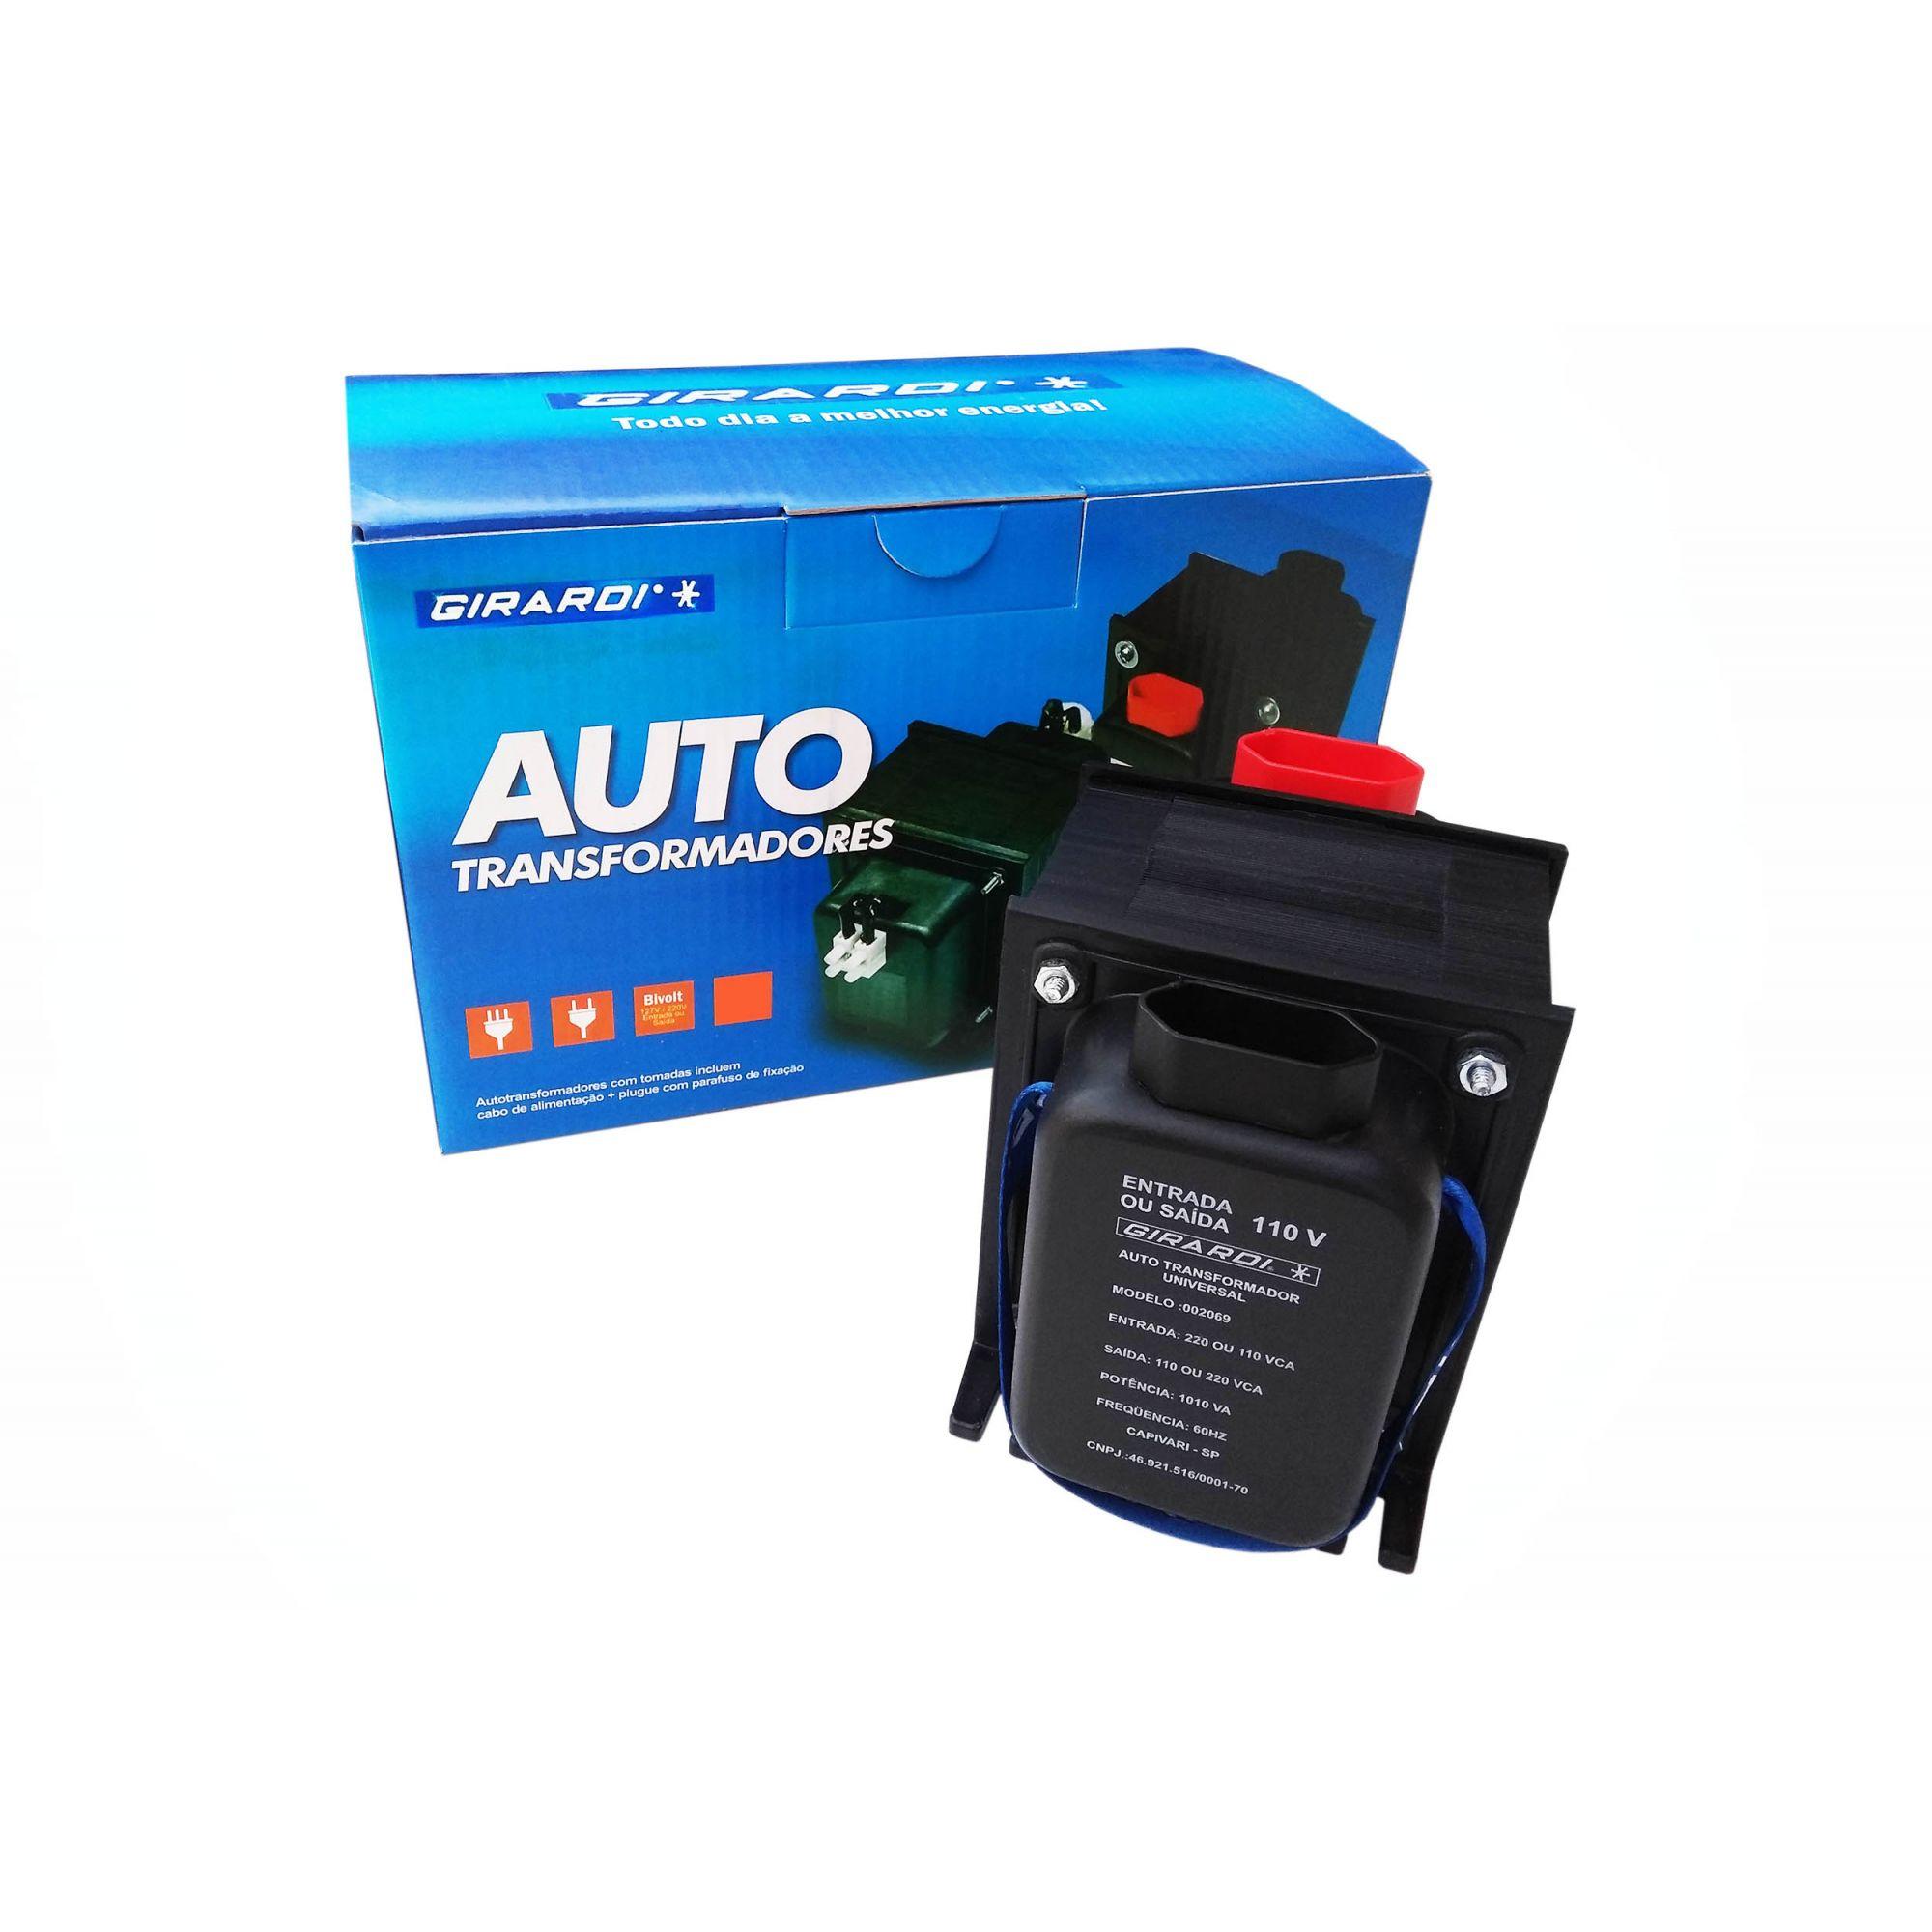 Auto Transformador Conversor Bivolt 110 / 127 e 220 V GIRARDI Profissional 750 VA / 525 W